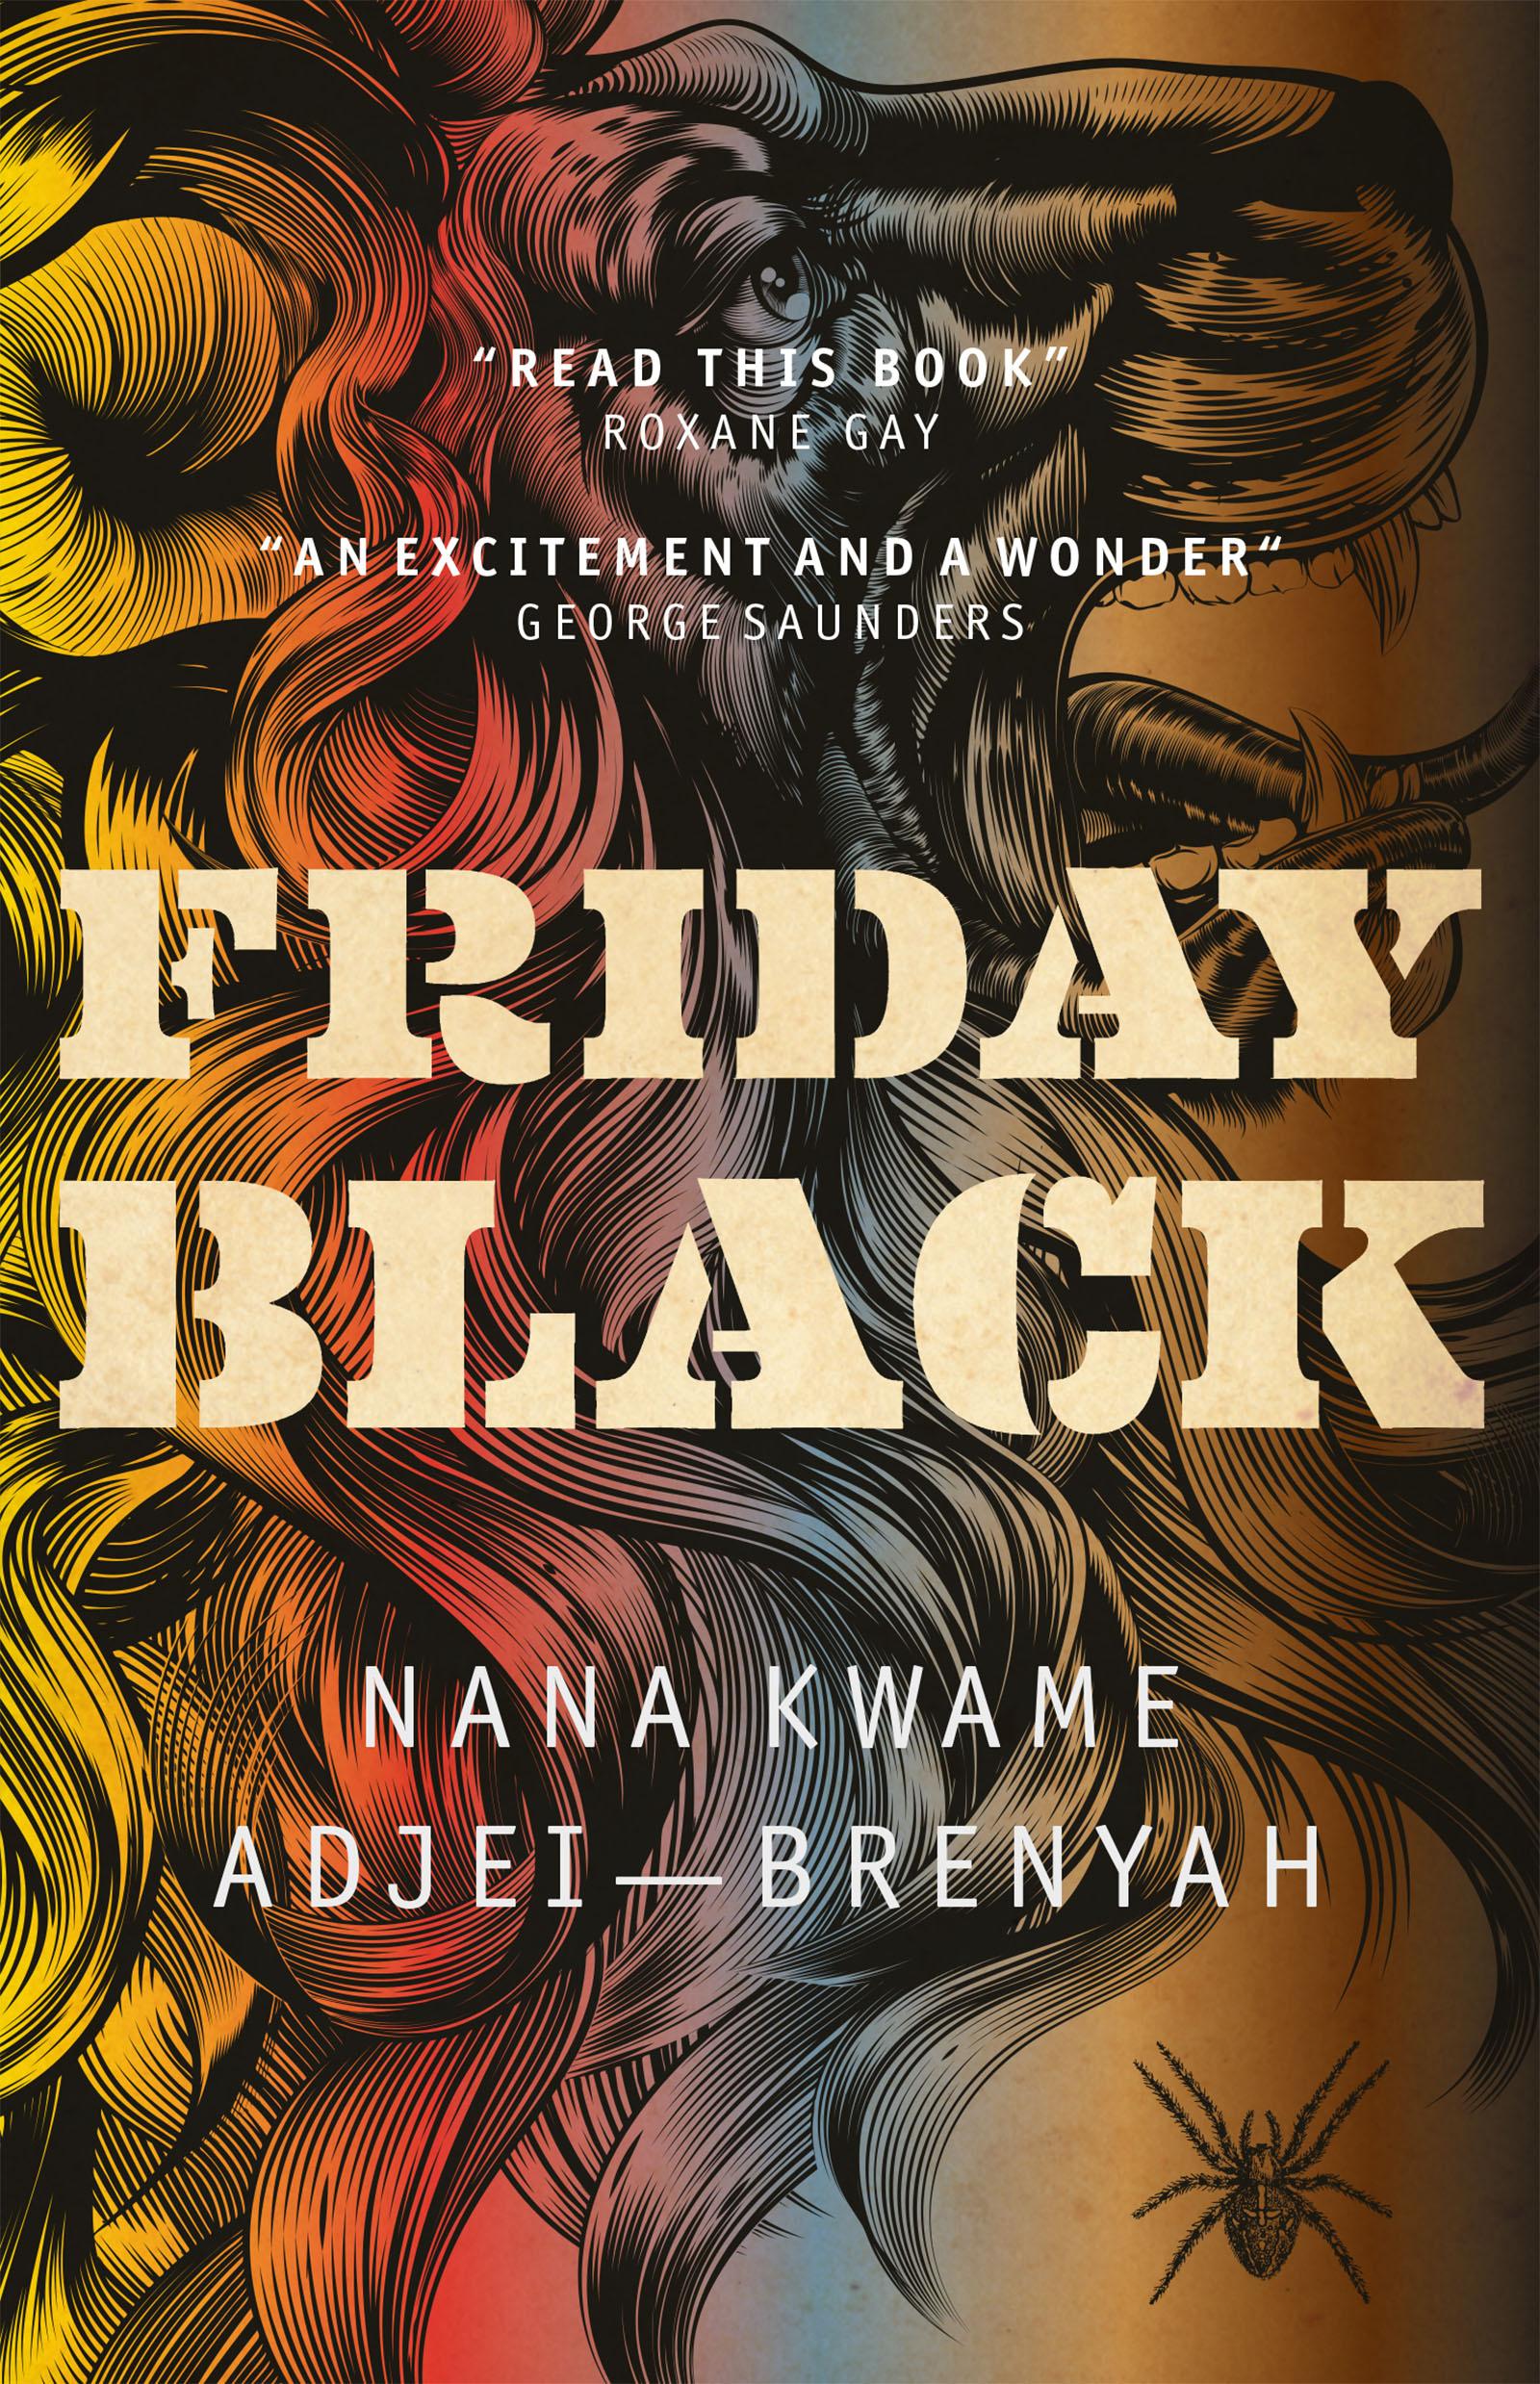 Image result for Friday Black by Nana Kwame Adjei-Brenyah